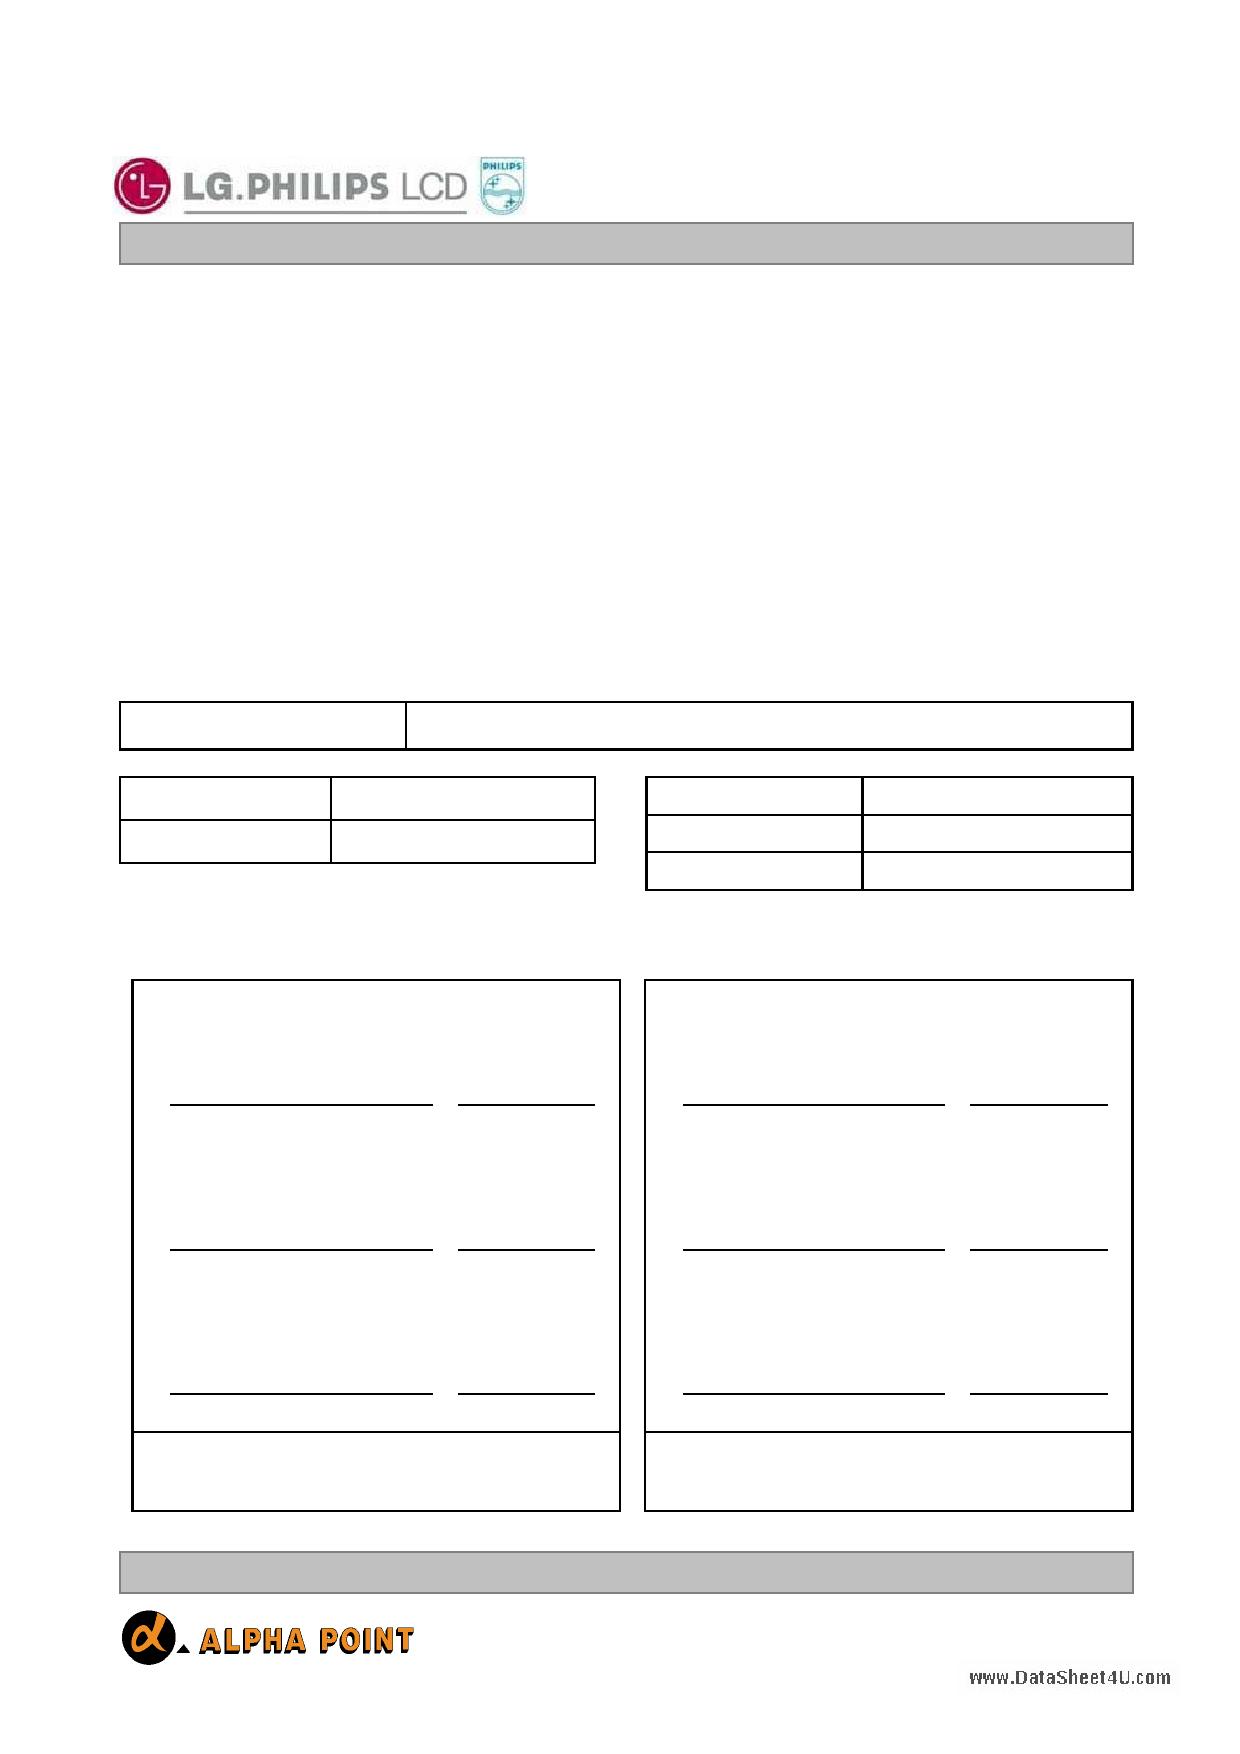 LC420W01 دیتاشیت PDF